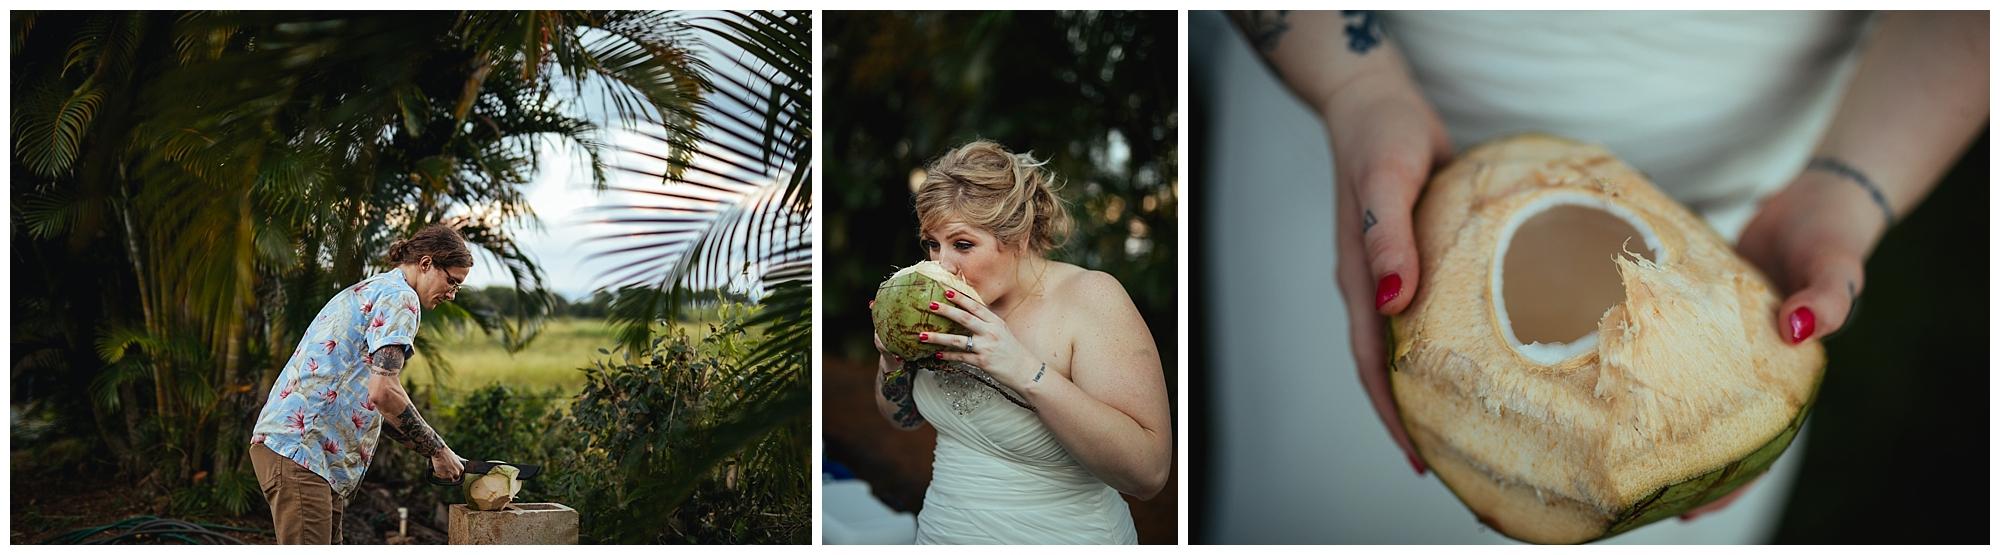 Kauai-Wedding_0013.jpg